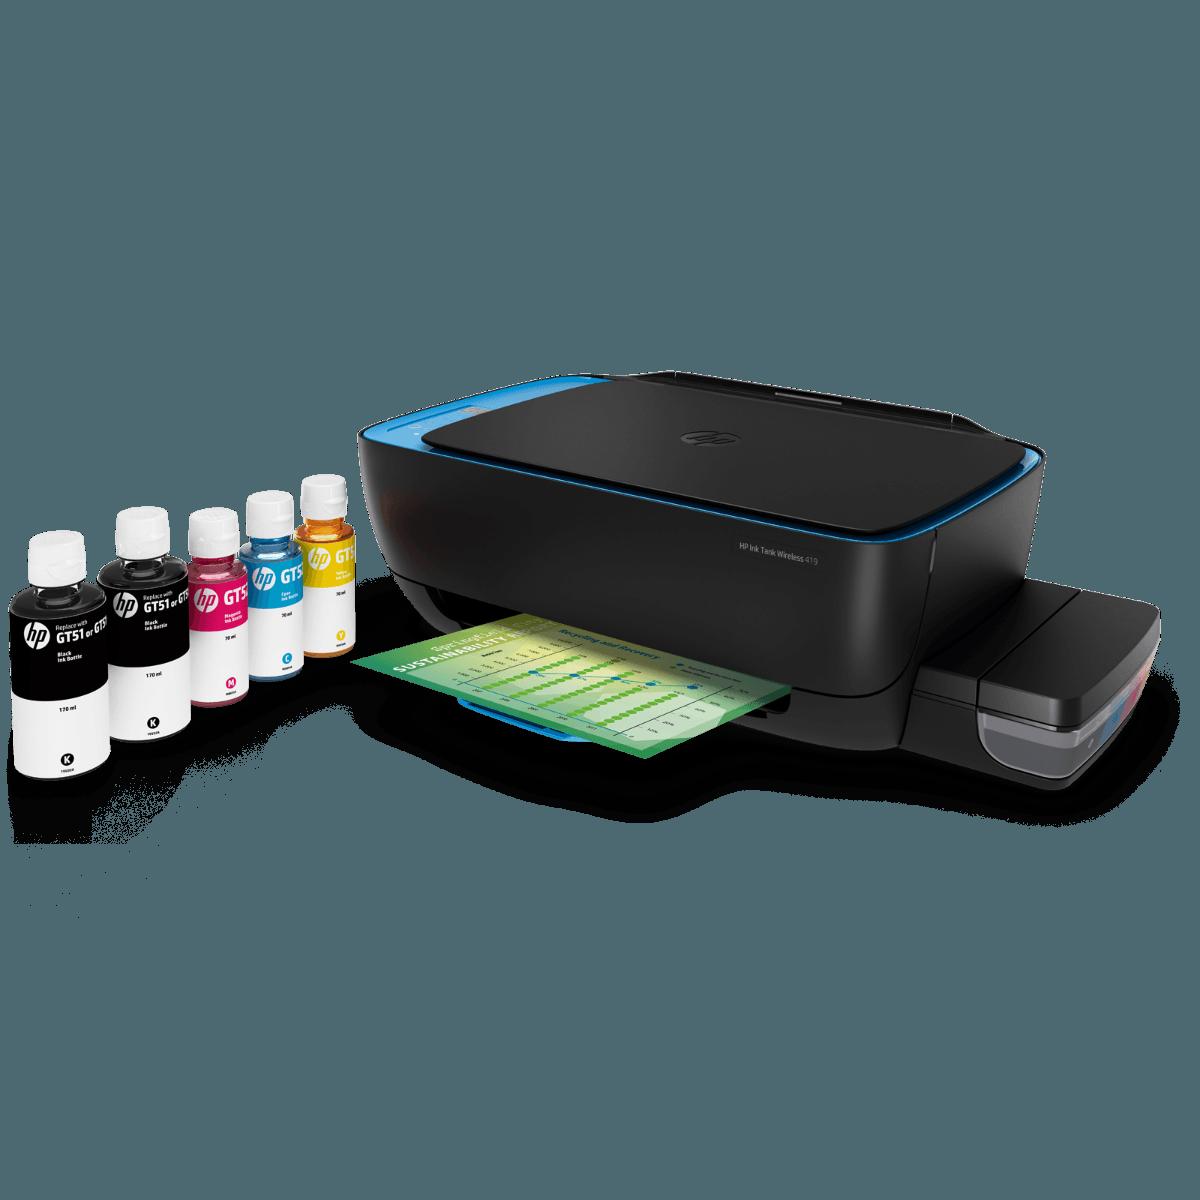 HP Ink Tank Wireless 419 All-in-One